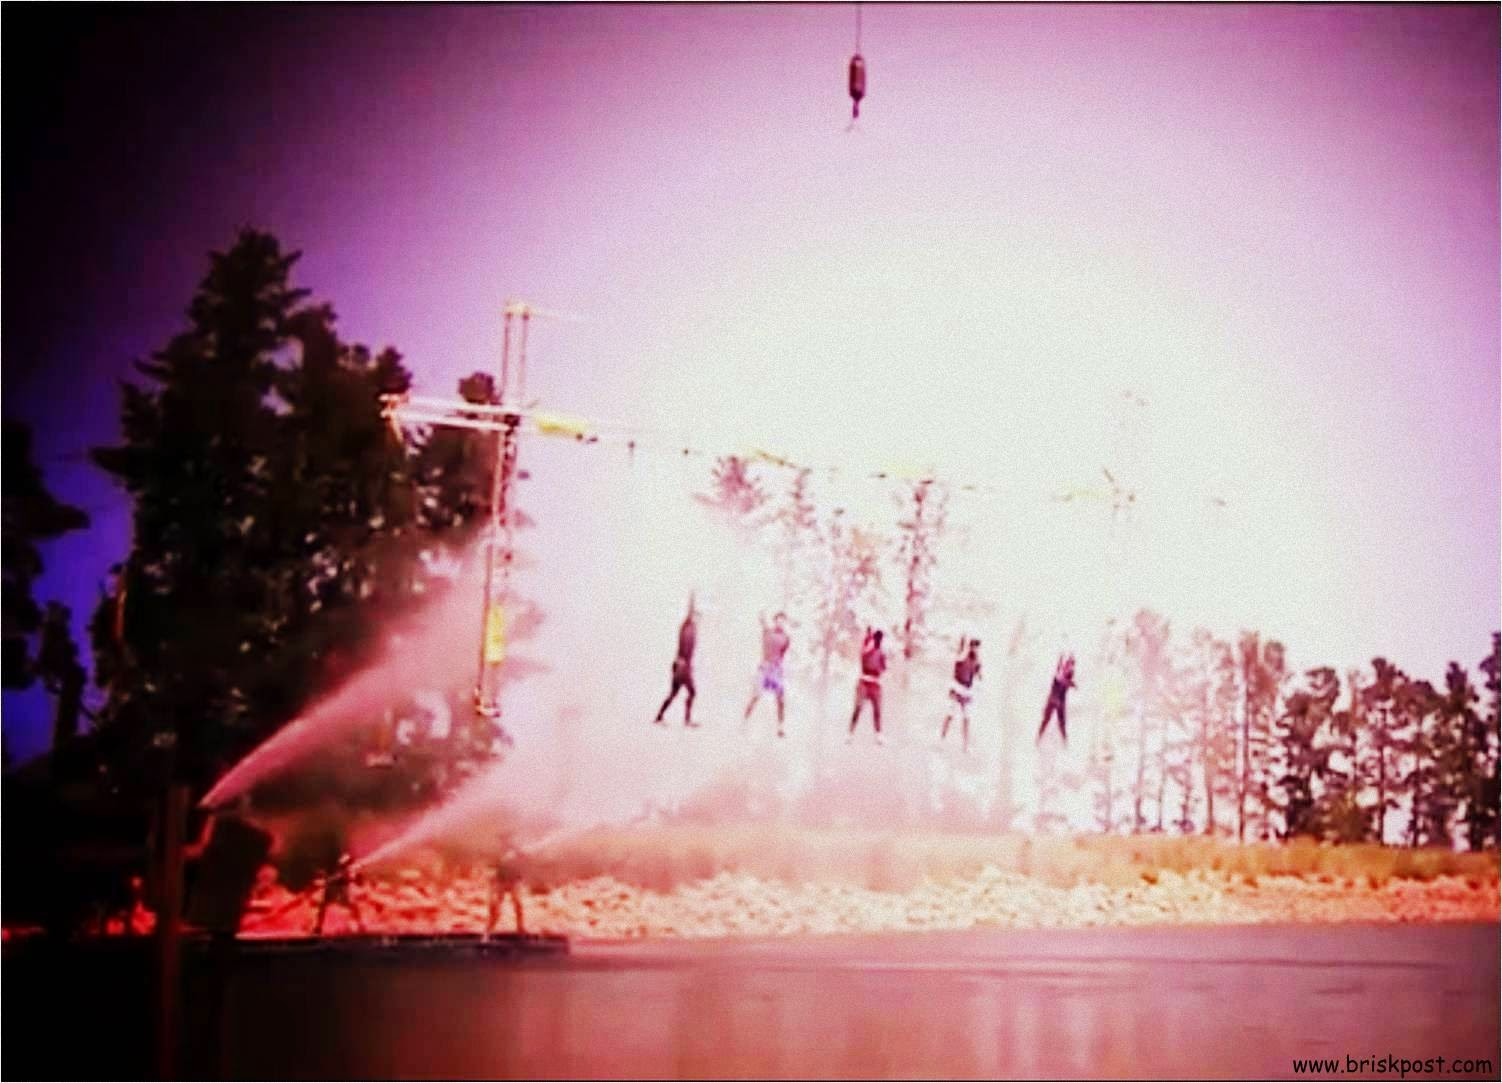 Khatron Ke Khiladi contestants making balance on a rope in front of forceful shower over river water during Standing Ovation Stunt in Fear Factor Darr Ka Blockbuster